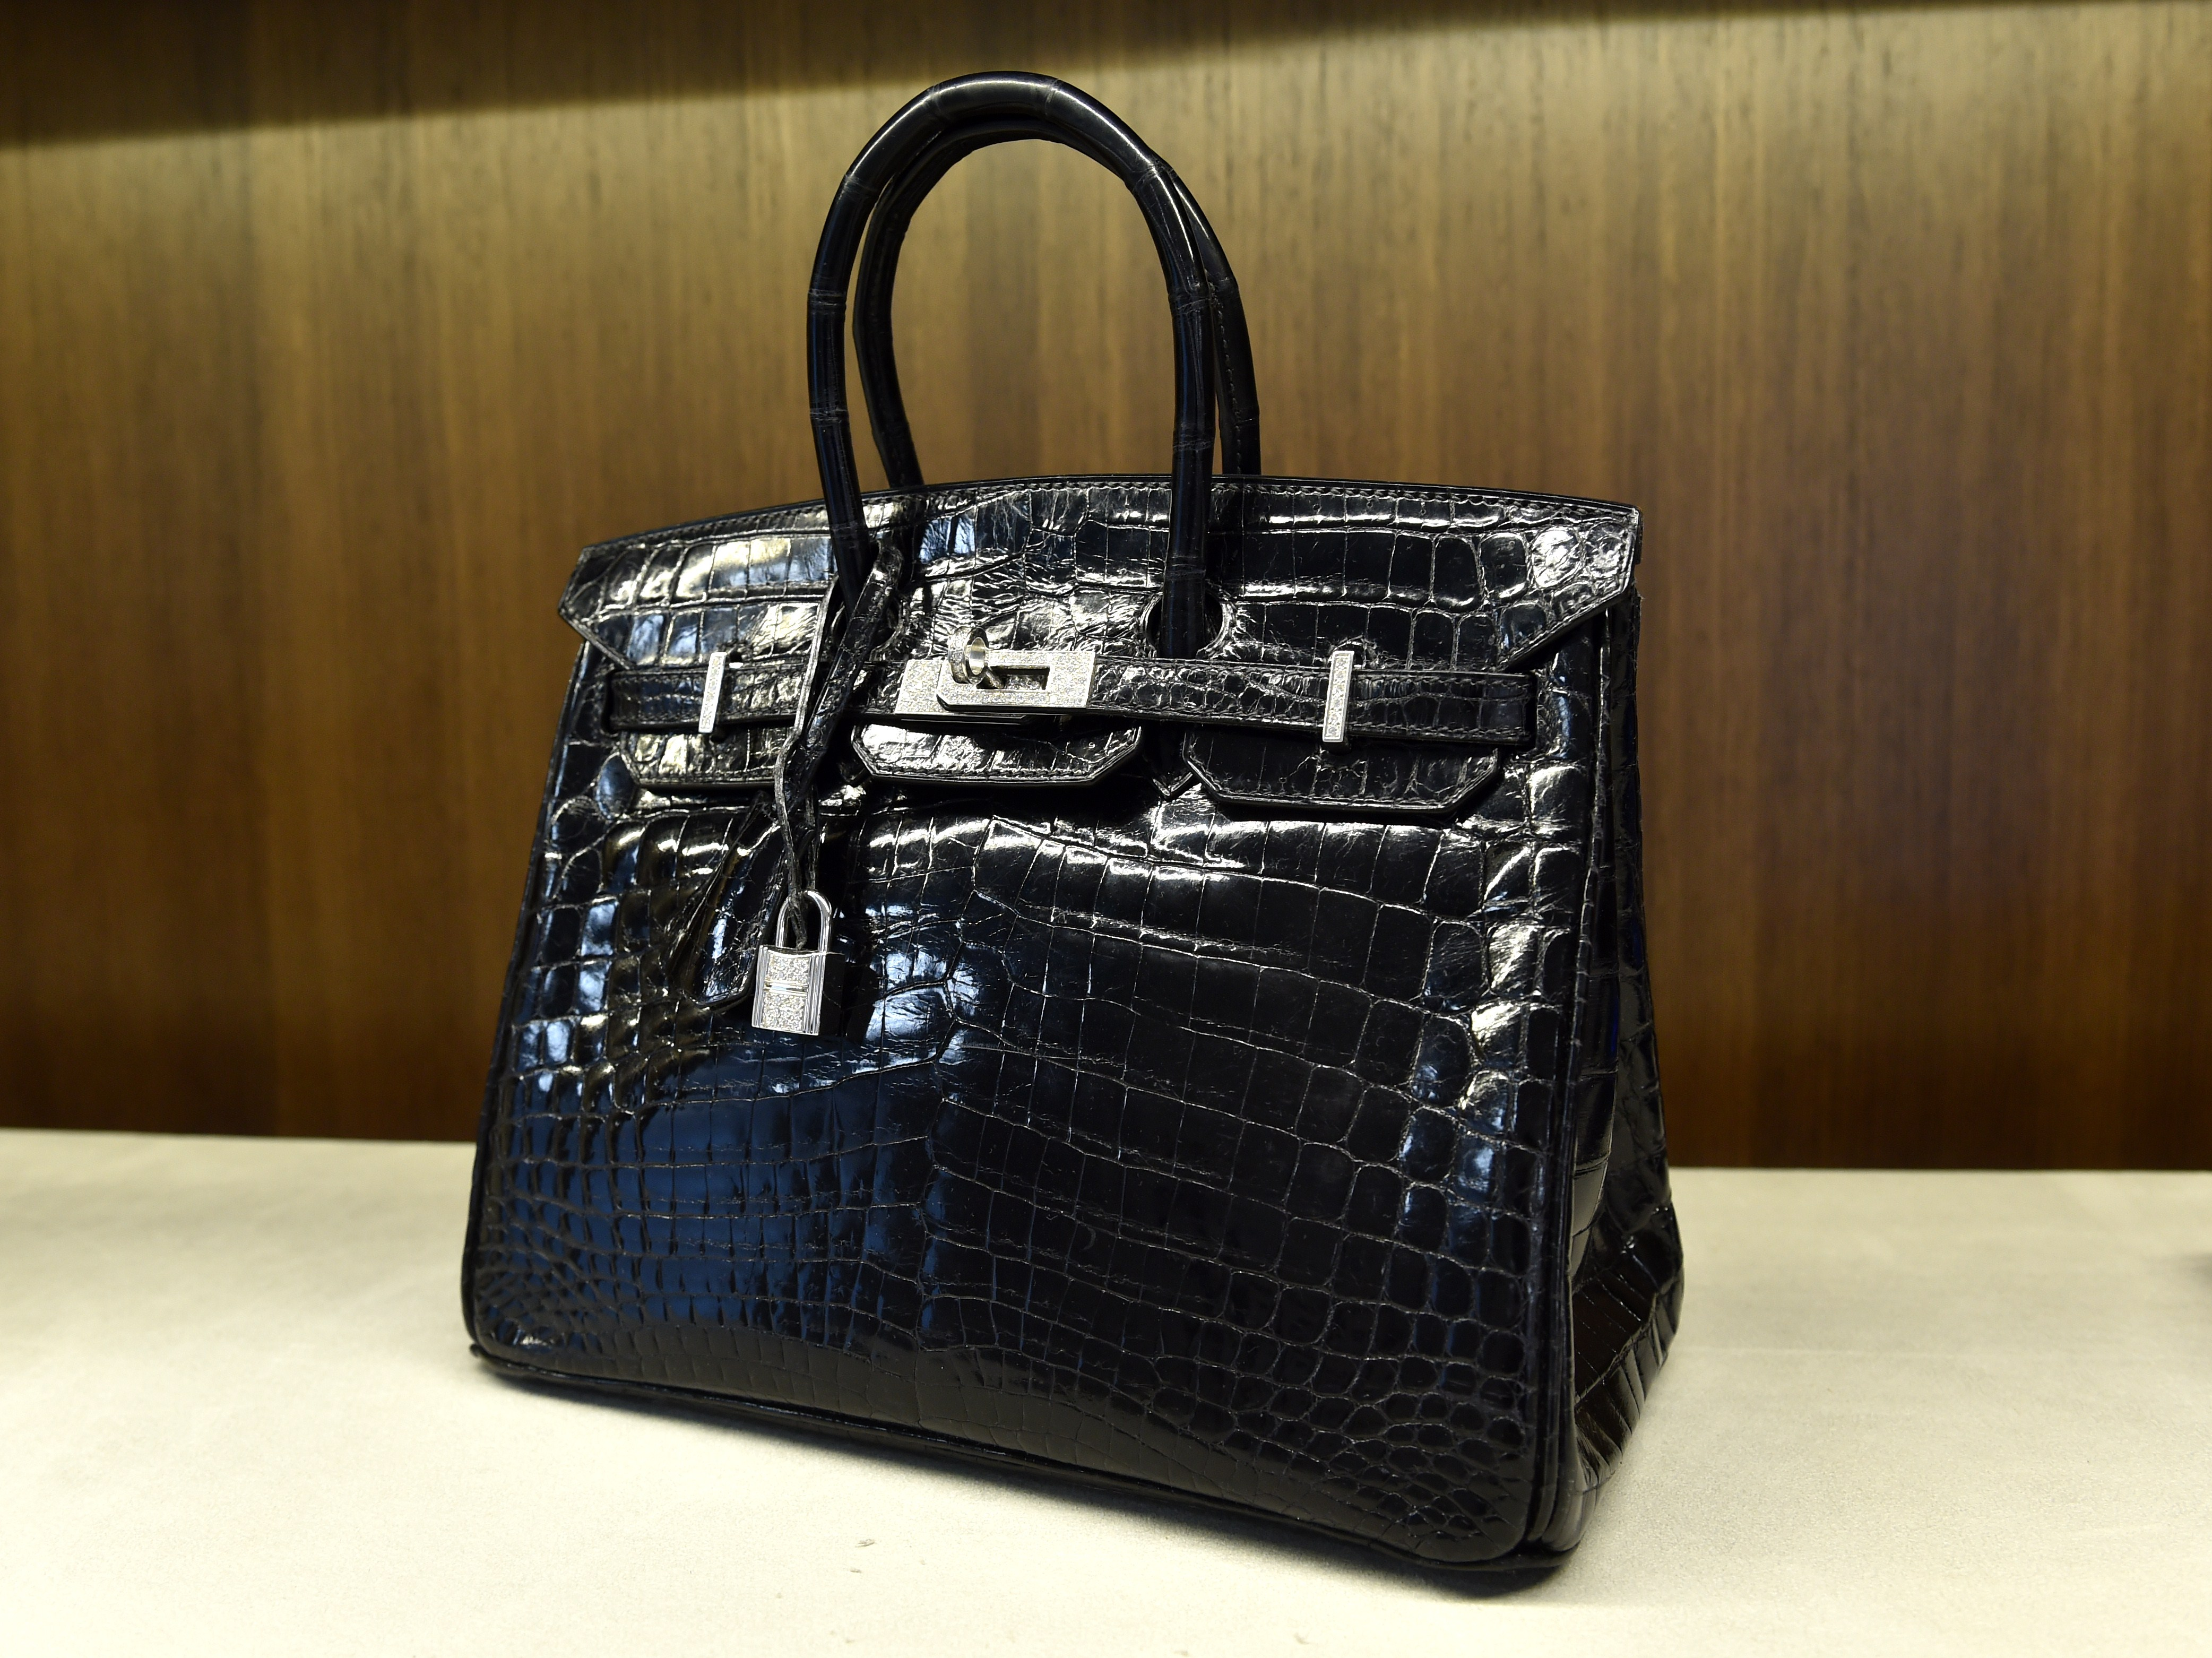 dcb26266cd34 Jane Birkin to Hermes  Take my name off croc handbag - CBS News